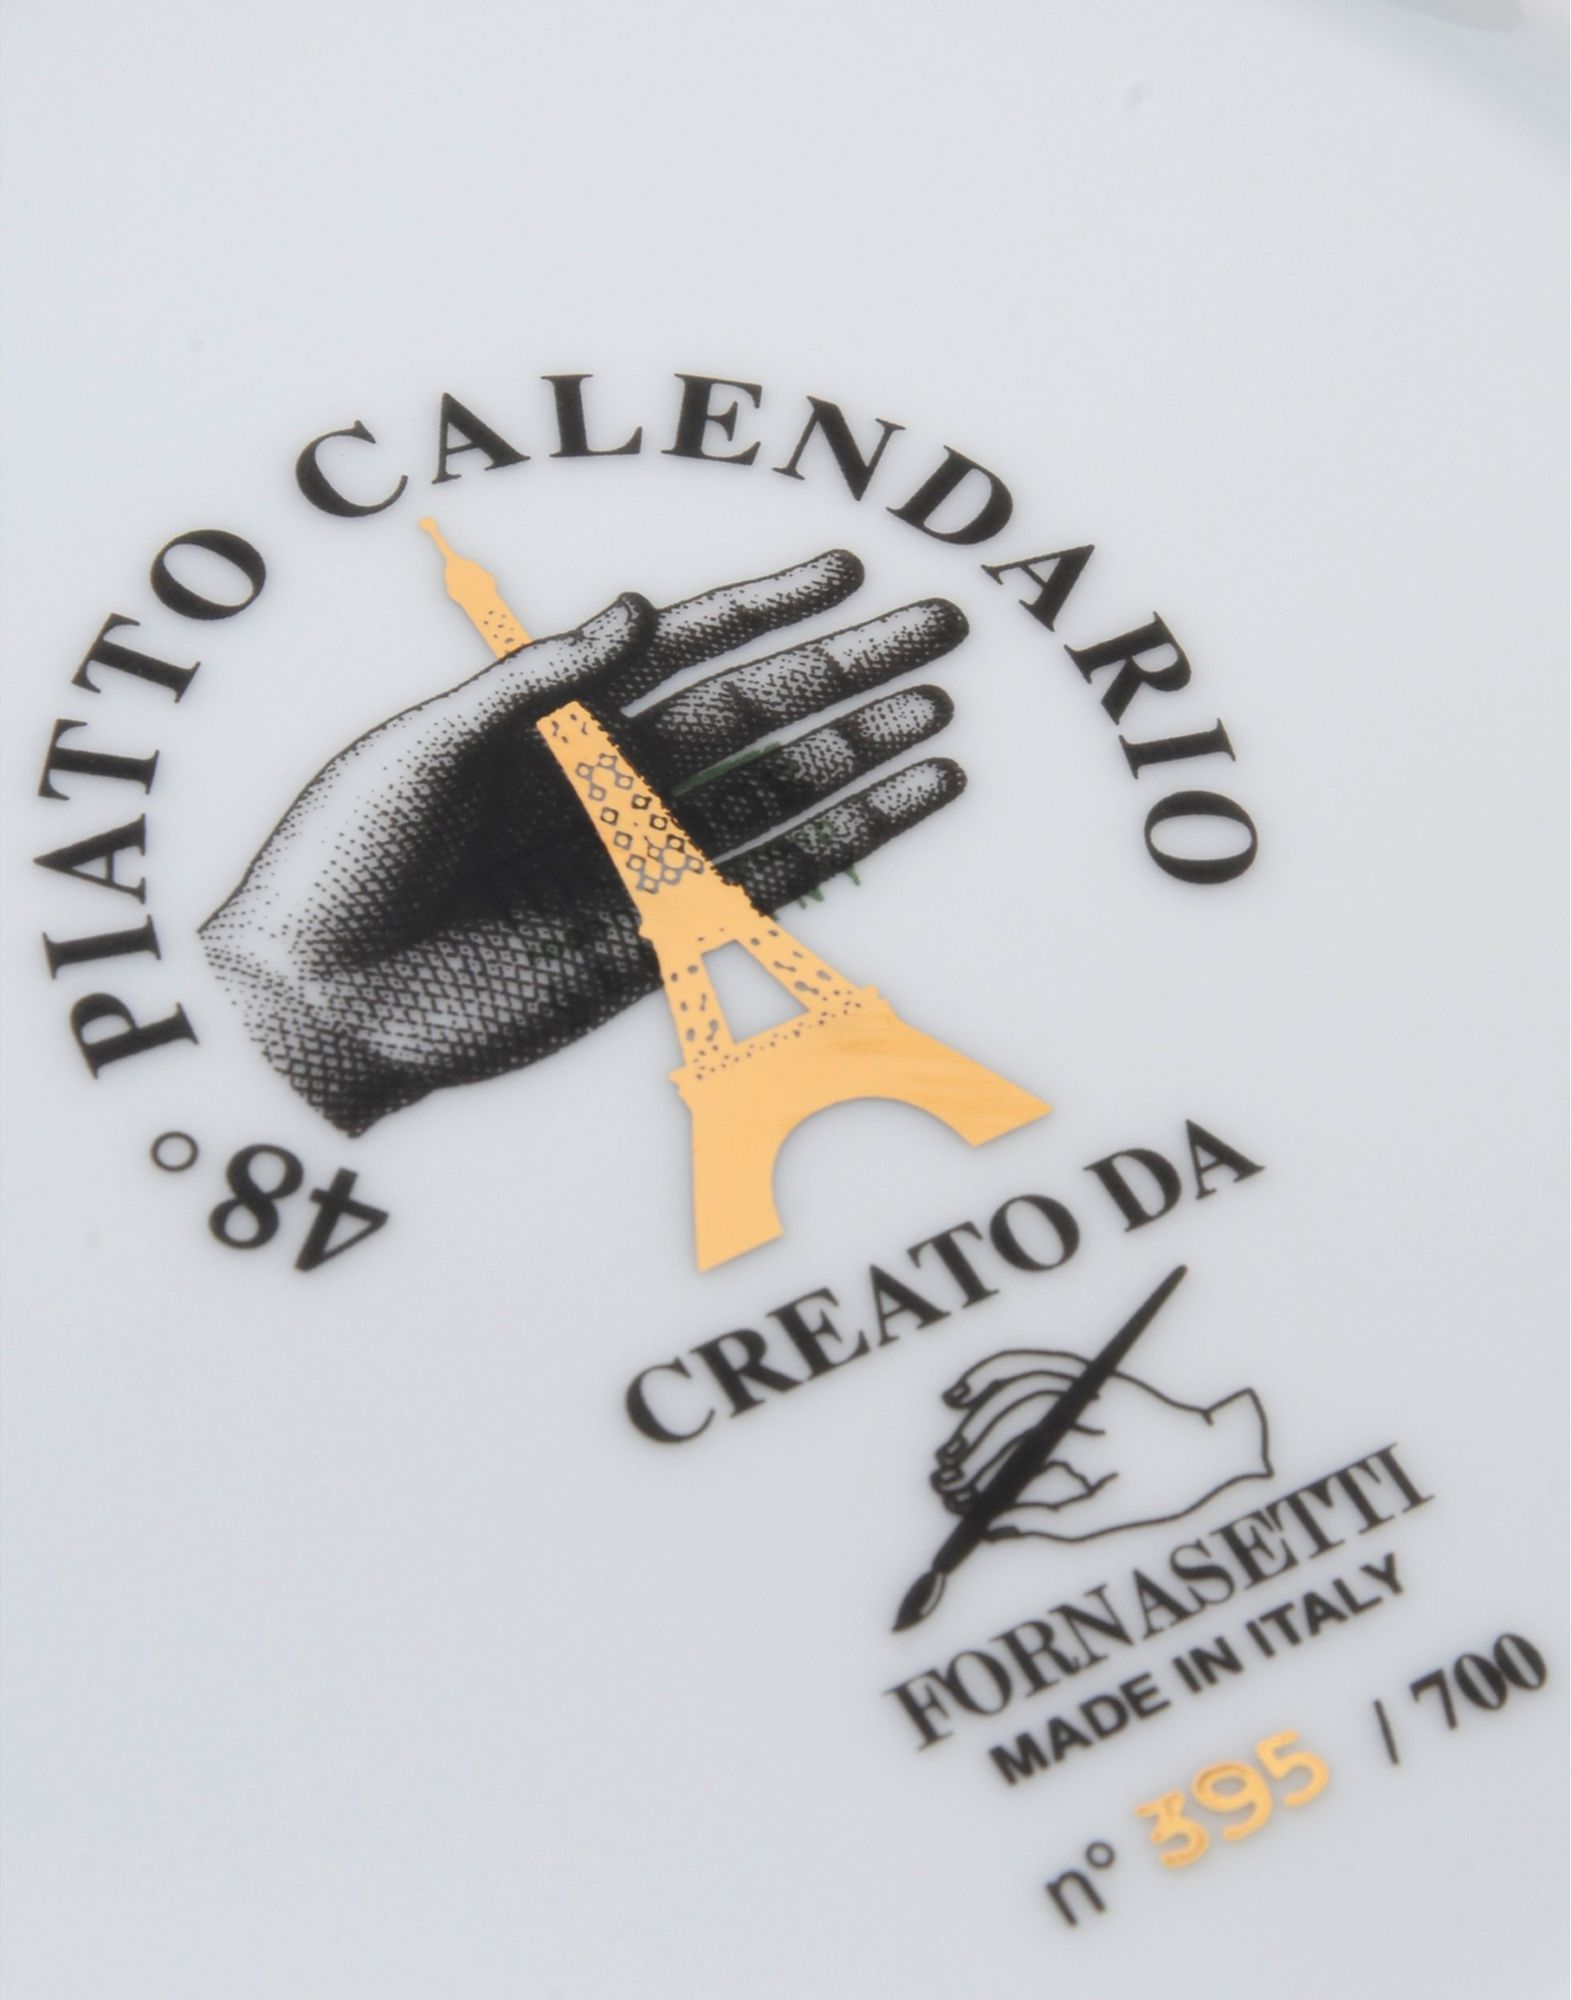 Fornasetti Calendario 2015 - 雑貨 - Design Fornasetti | yoox.com - 58024204JW